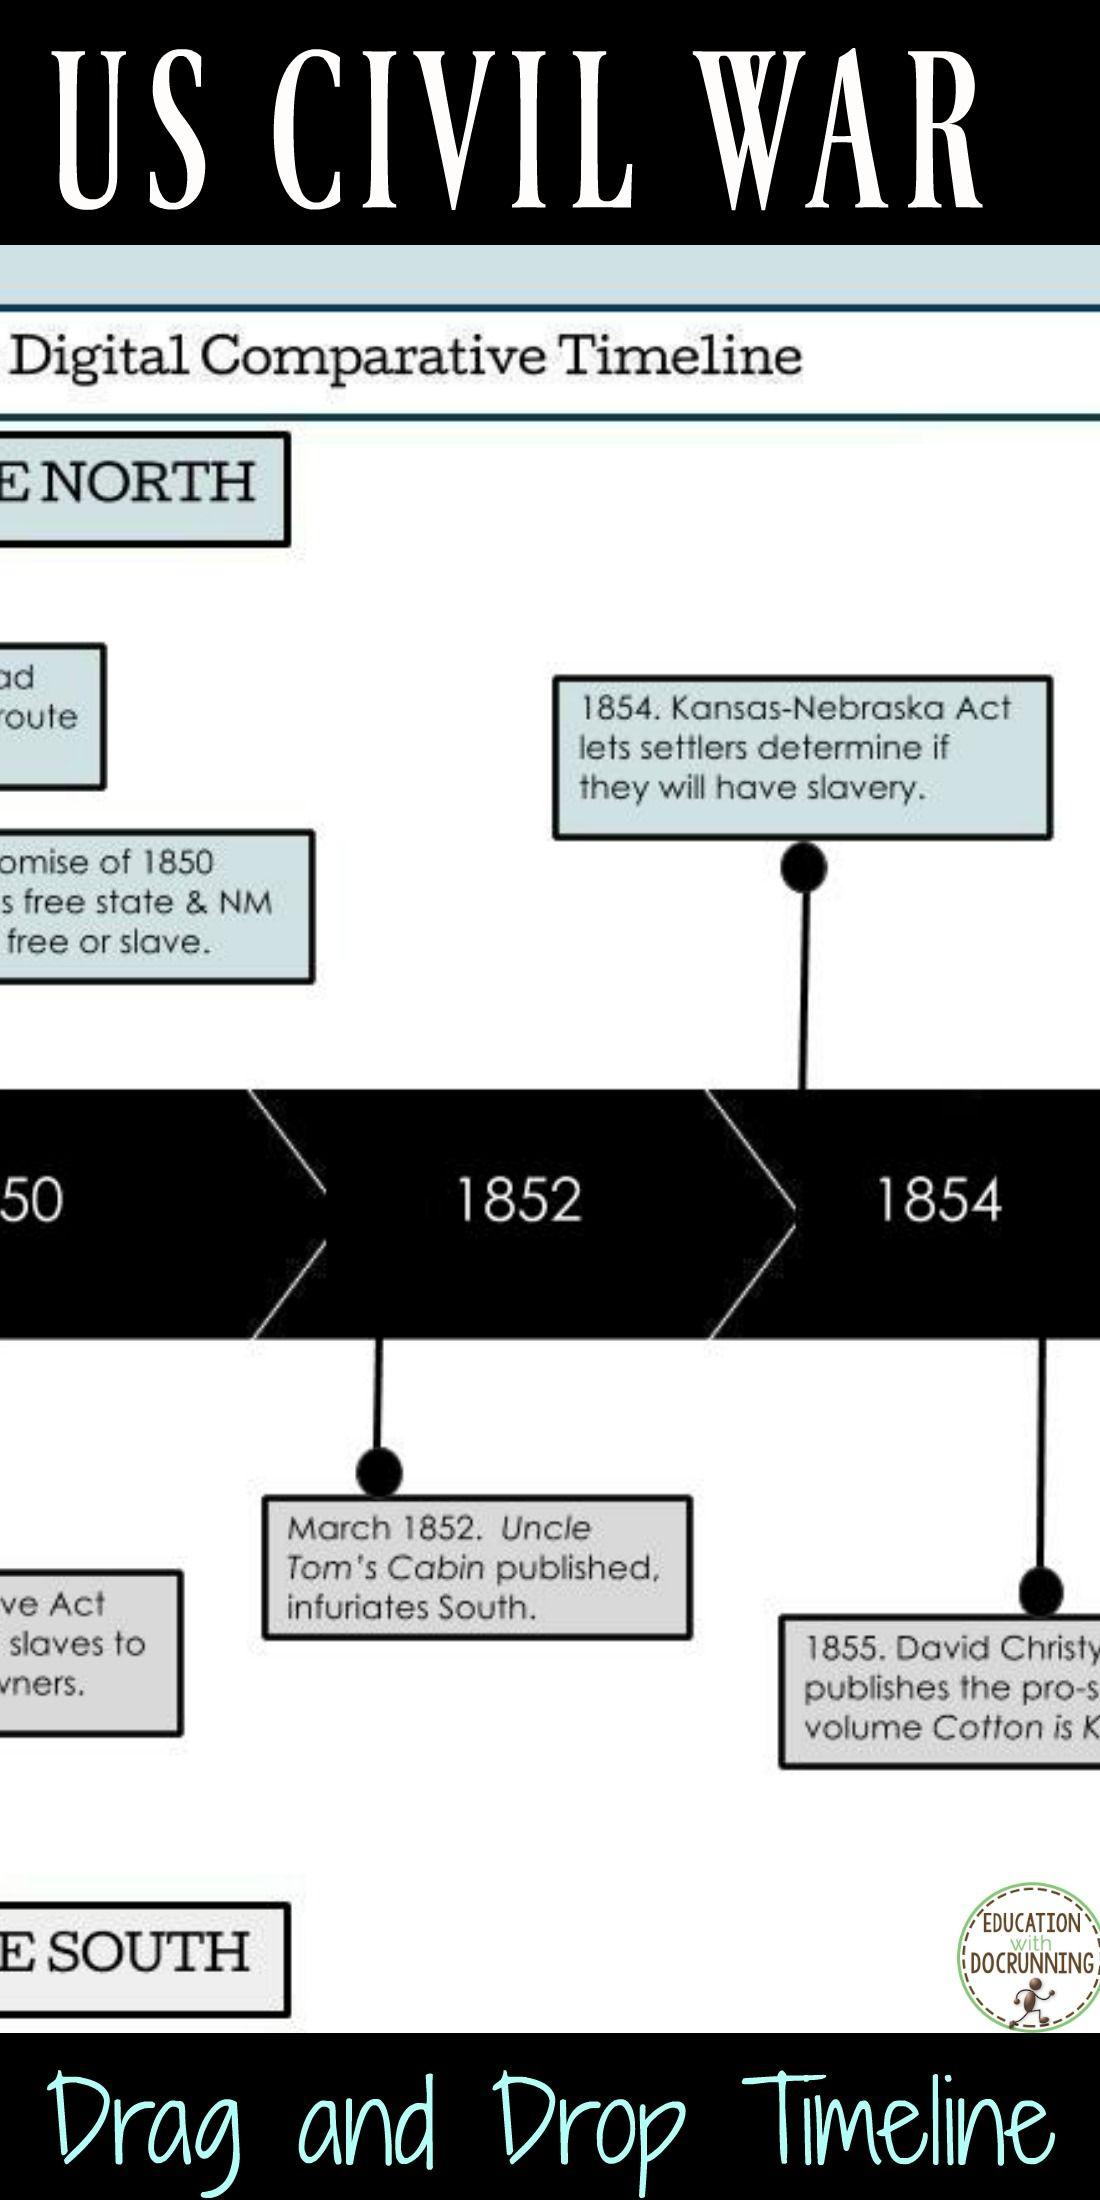 Us Civil War Causes Of The War Digital Comparative